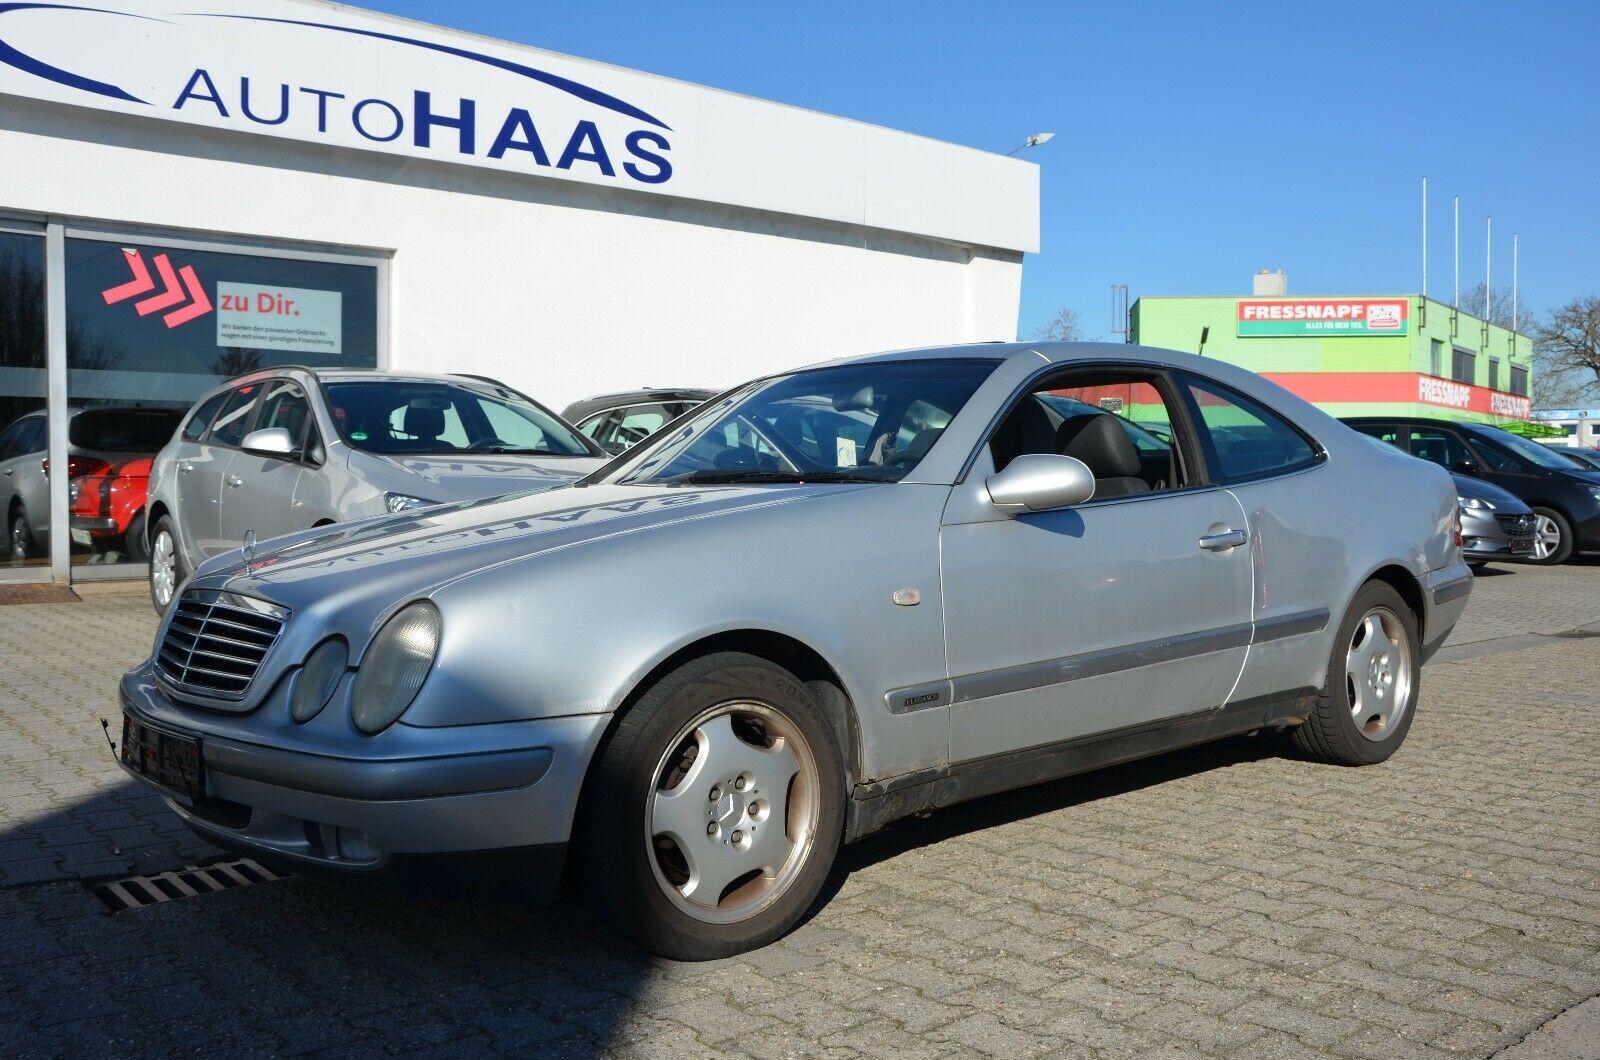 MERCEDES-BENZ CLK Coupe 230 K Automatic Leder 169 TKM Rentnerf